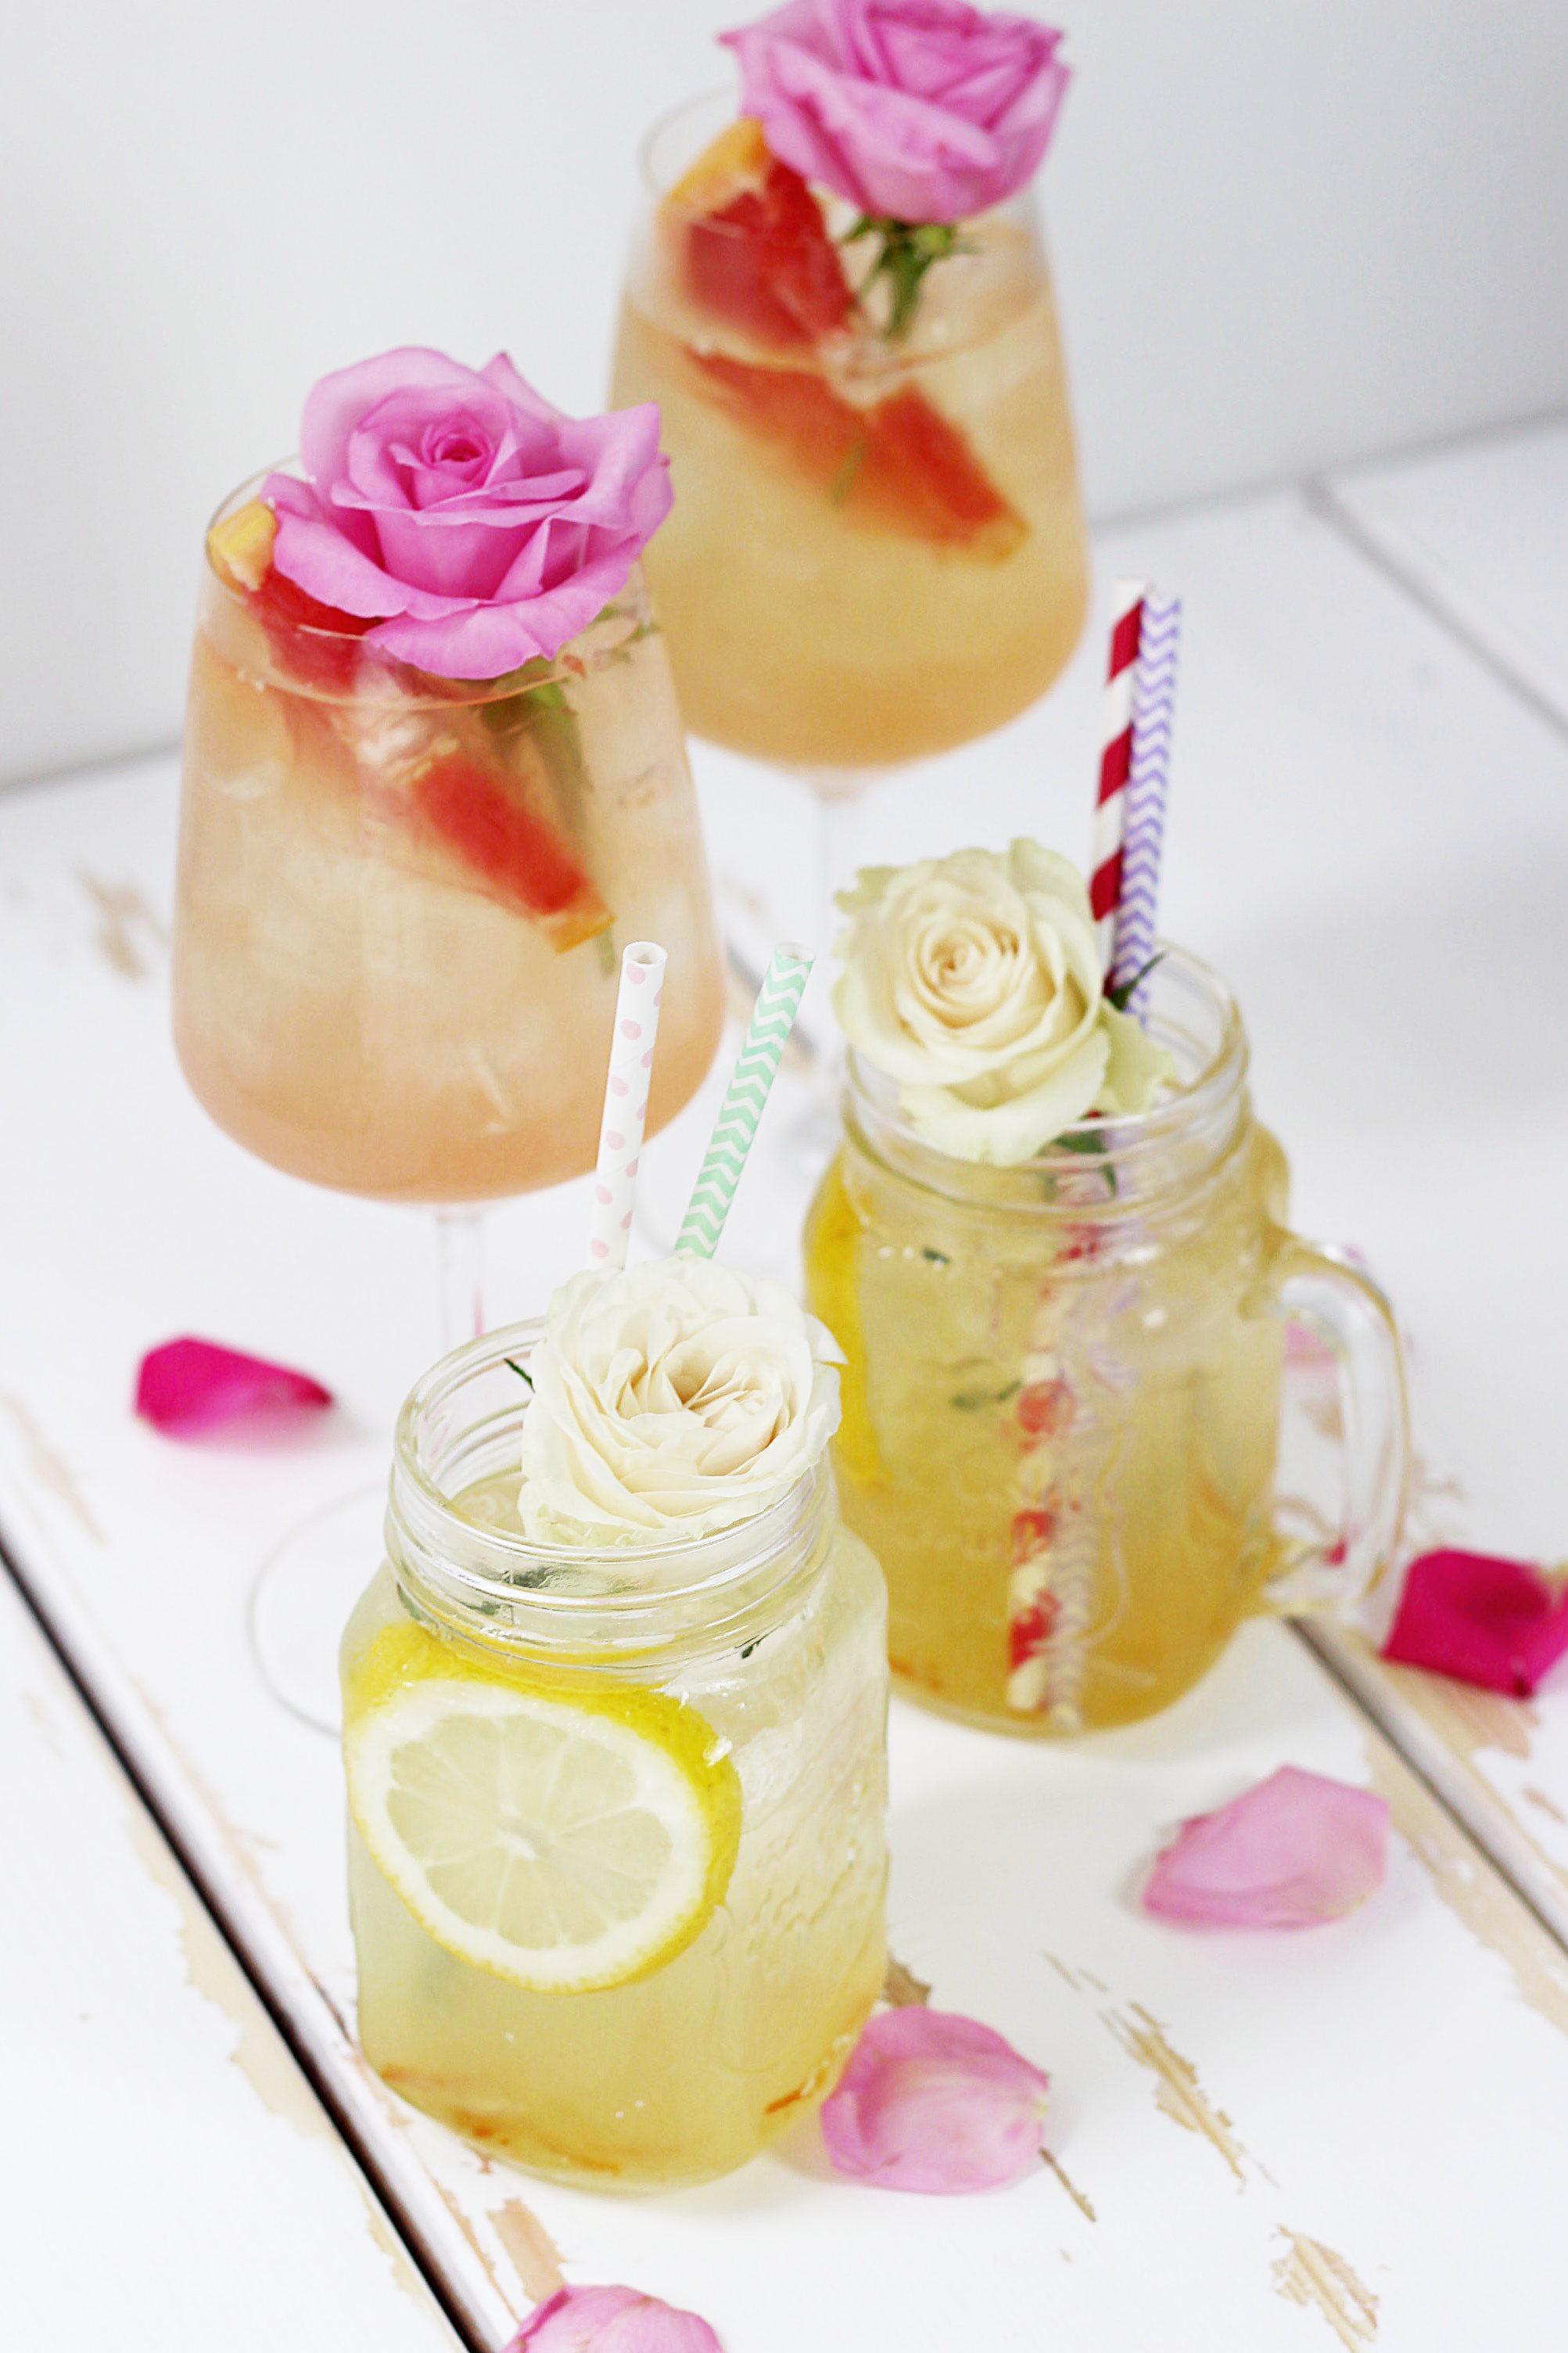 Rezepte-Sommer-Drinks-Limonade-Selbermachen-DIY-Blog-Berlin